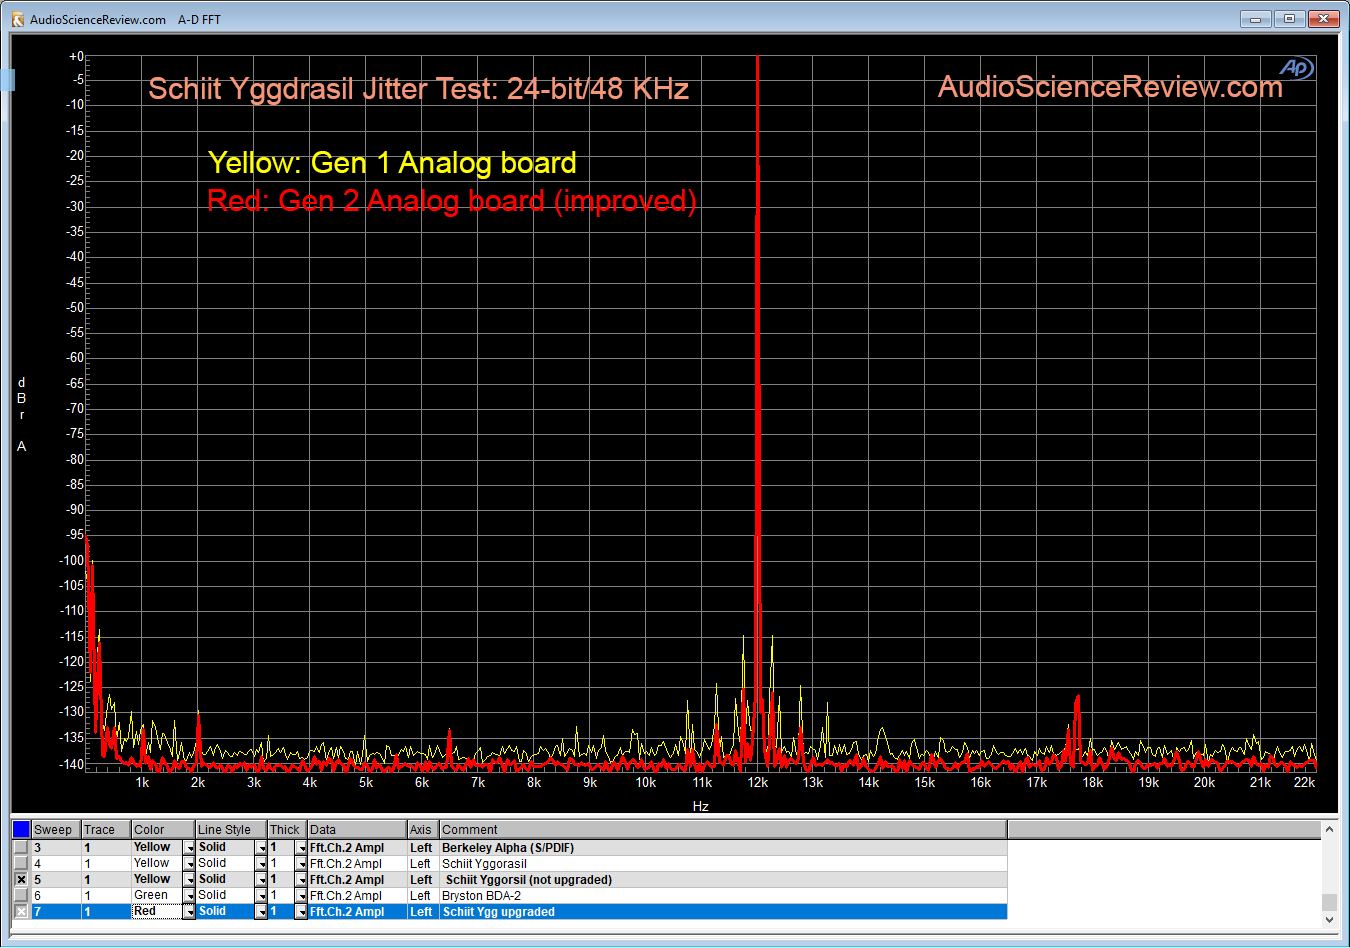 Schiit Yggdrasil DAC Jitter Measurement.psd.png